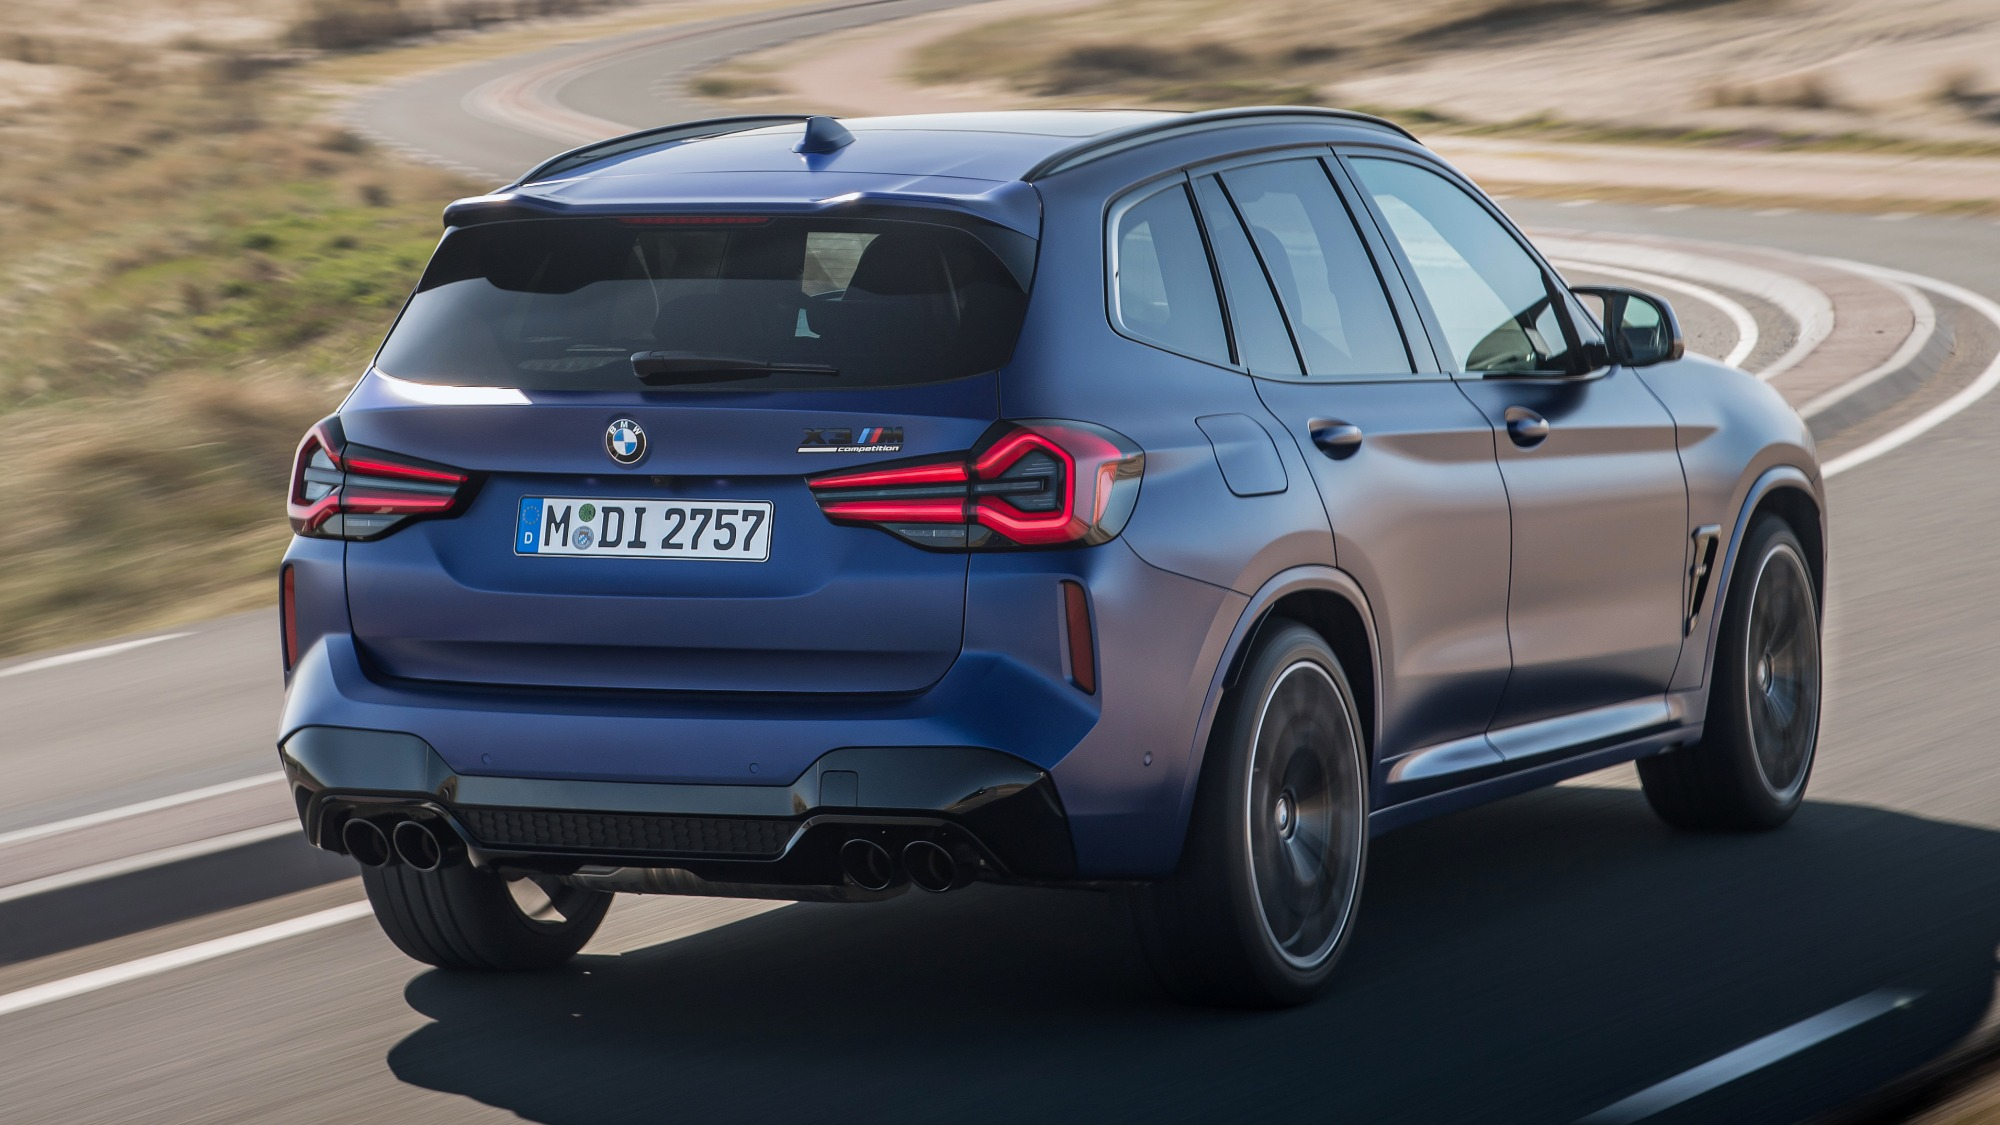 BMW X3 Competition 2022 azul visto 3/4 de trás